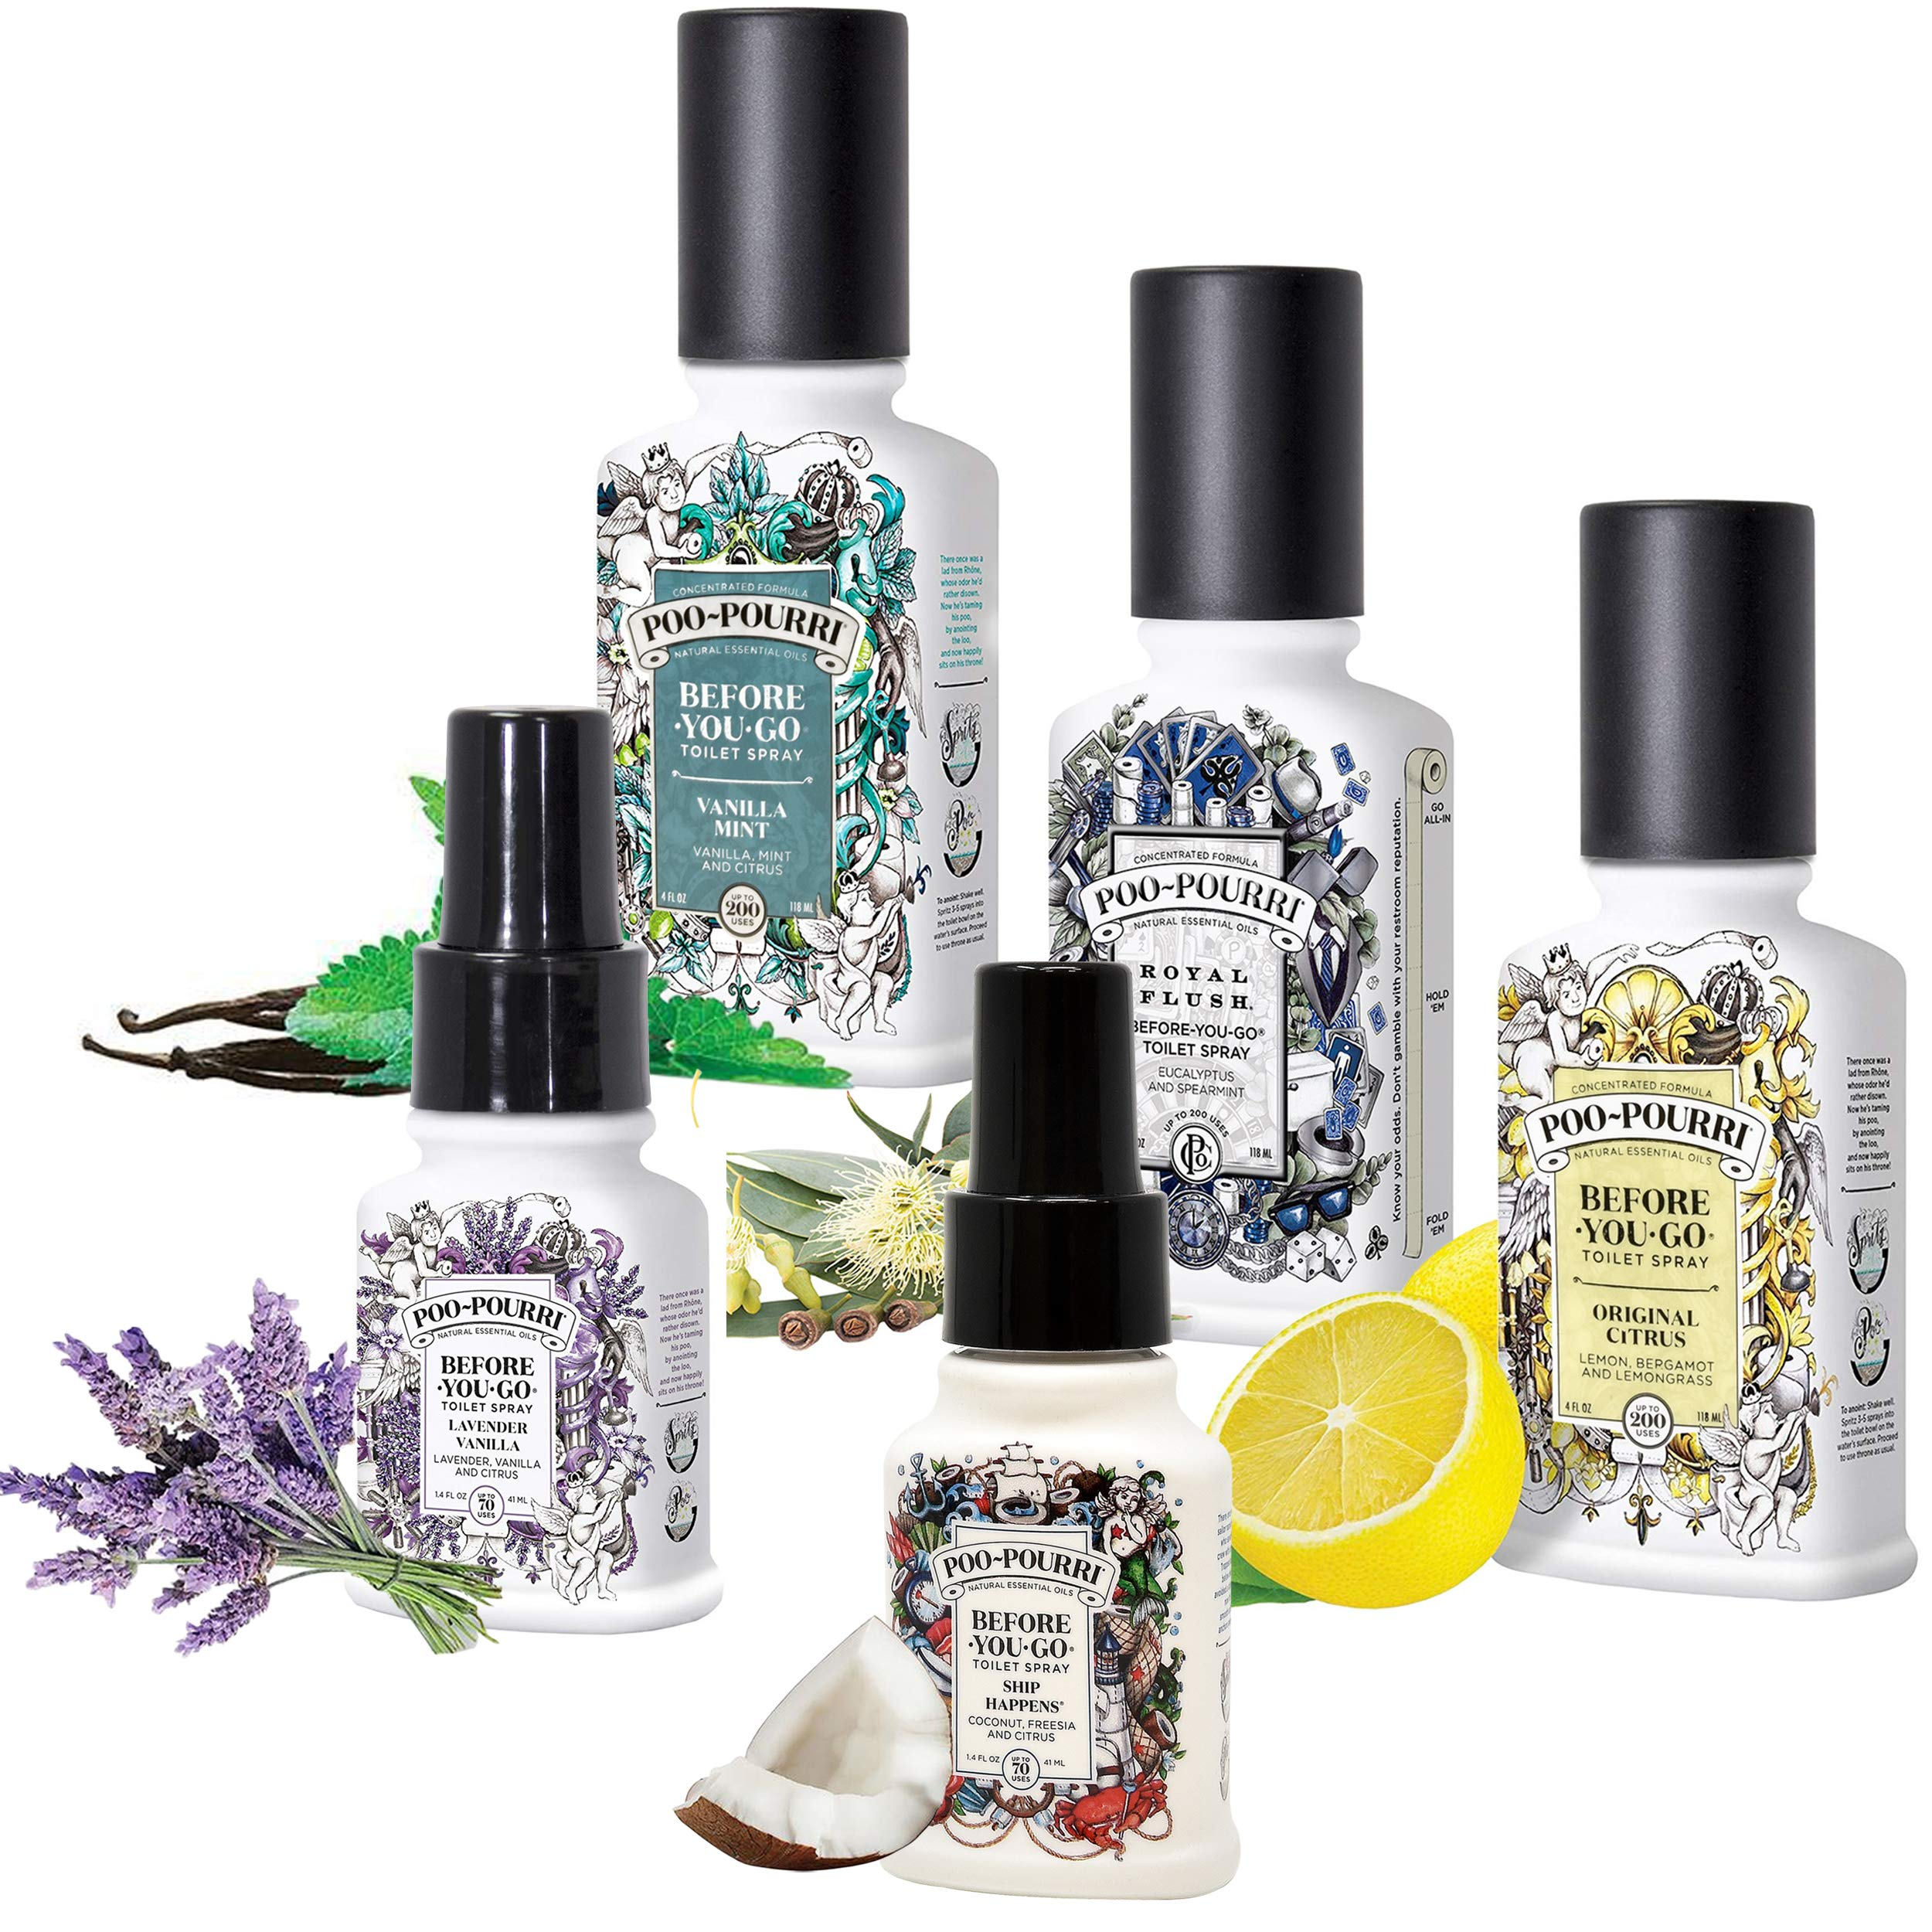 Poo-Pourri Set - Includes Original Citrus 4 Ounce, Royal Flush 4 Ounce, Vanilla Mint 4 Ounce, Ship Happens 1.4 Ounce, and Lavender Vanilla 1.4 Ounce by Poo-Pourri (Image #2)